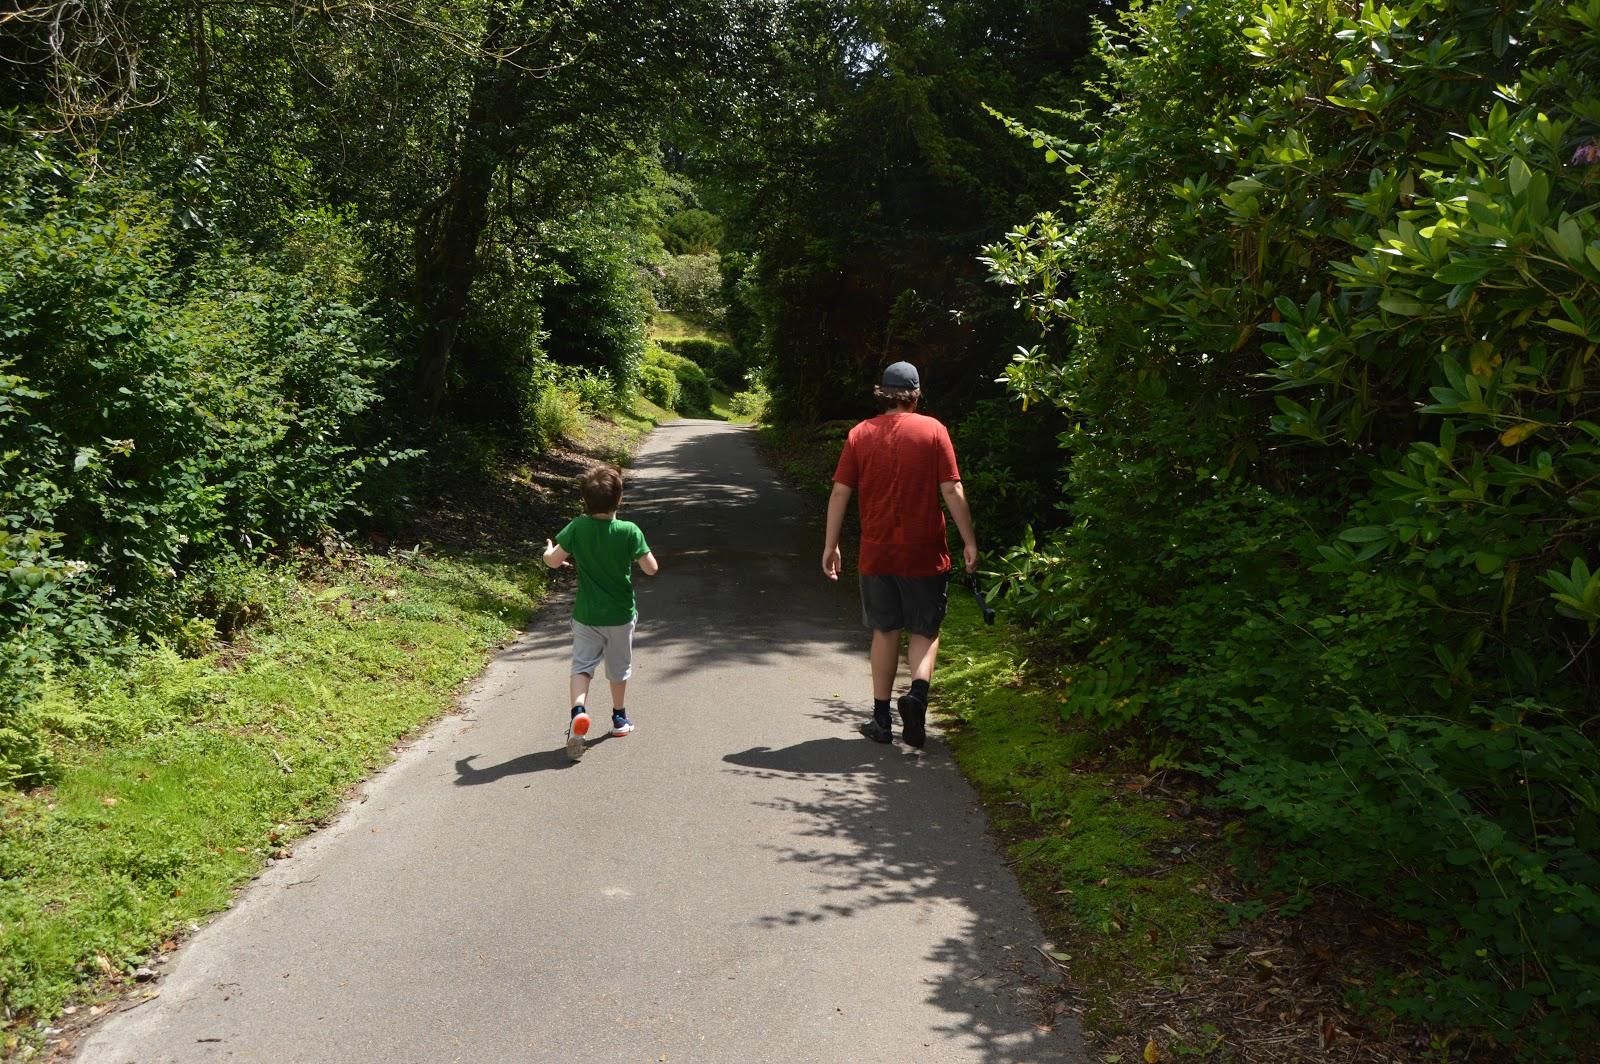 walking along a path